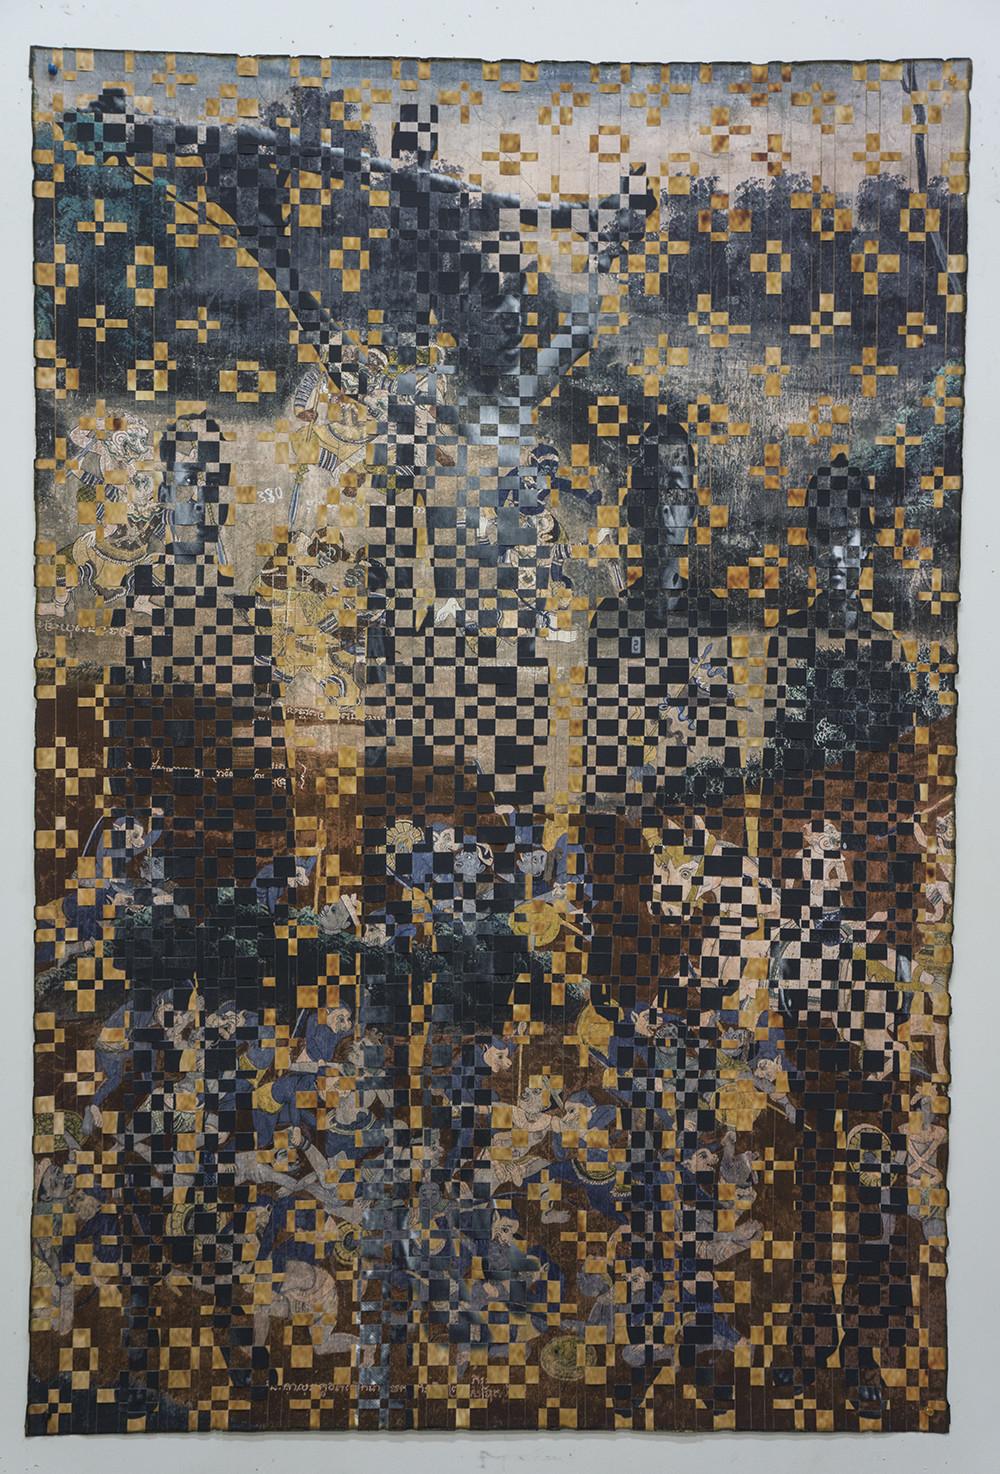 Dinh Q. Lê has a show of manipulated photographs at Shoshana Wayne Gallery.